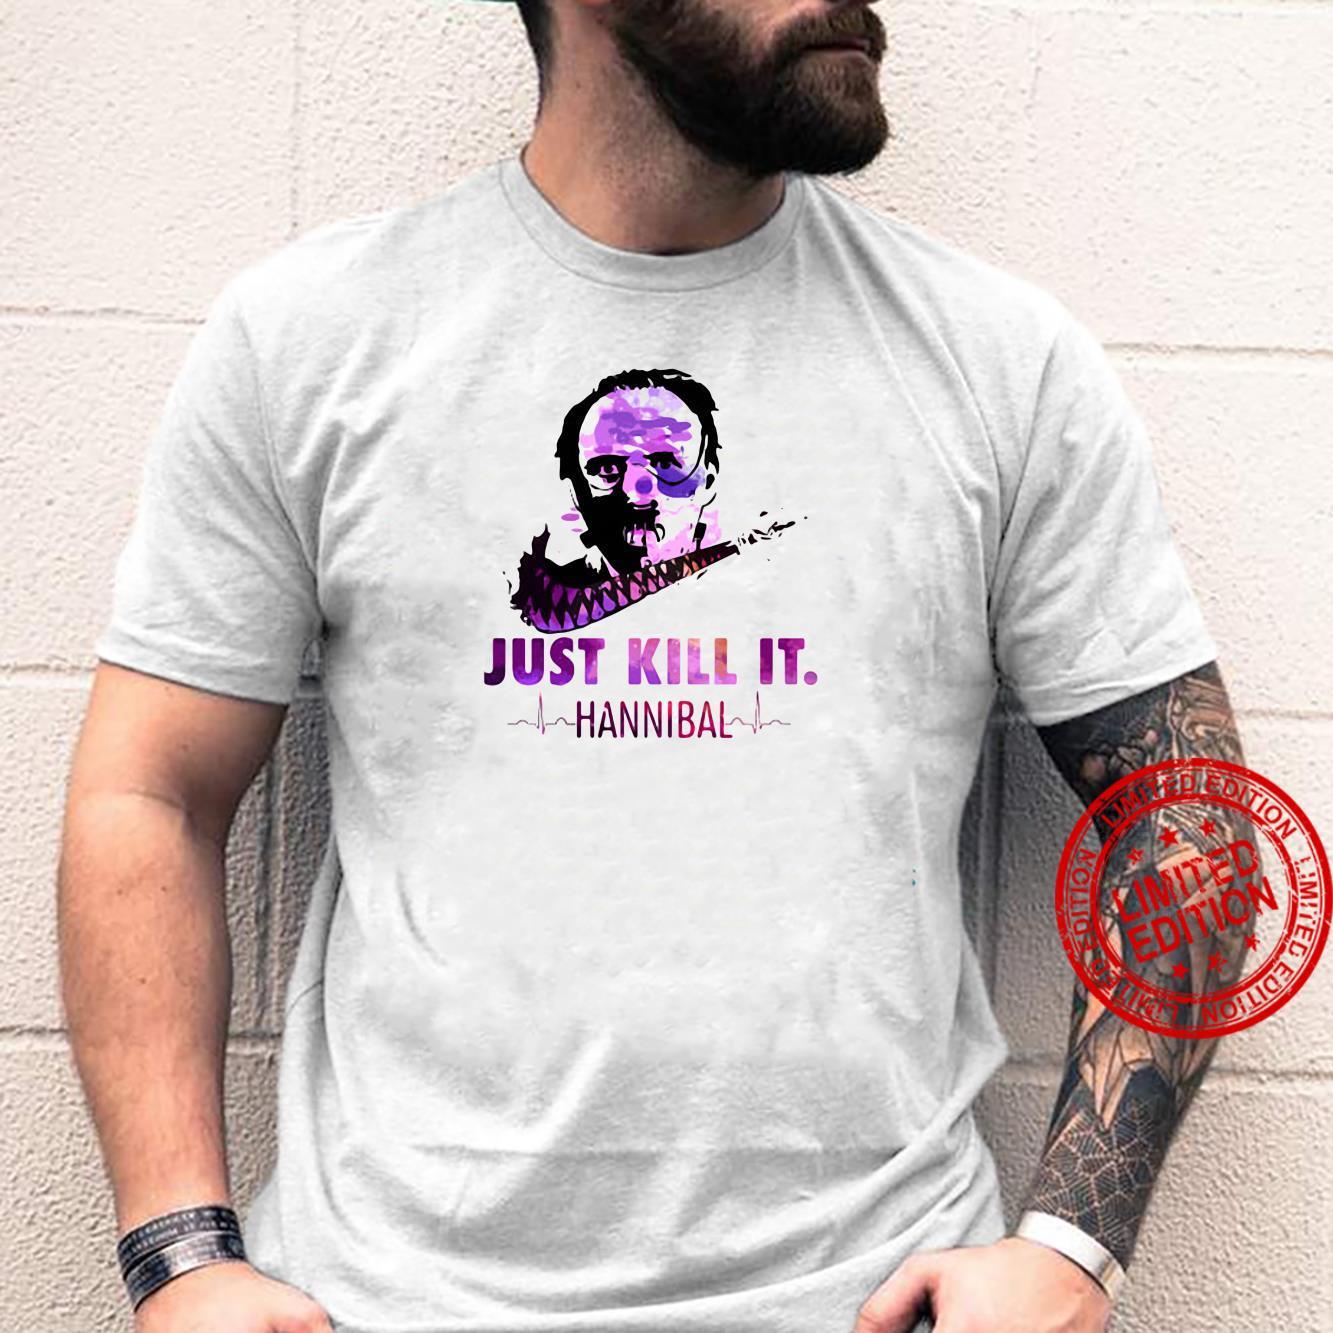 Hannibal Lecter just kill it shirt